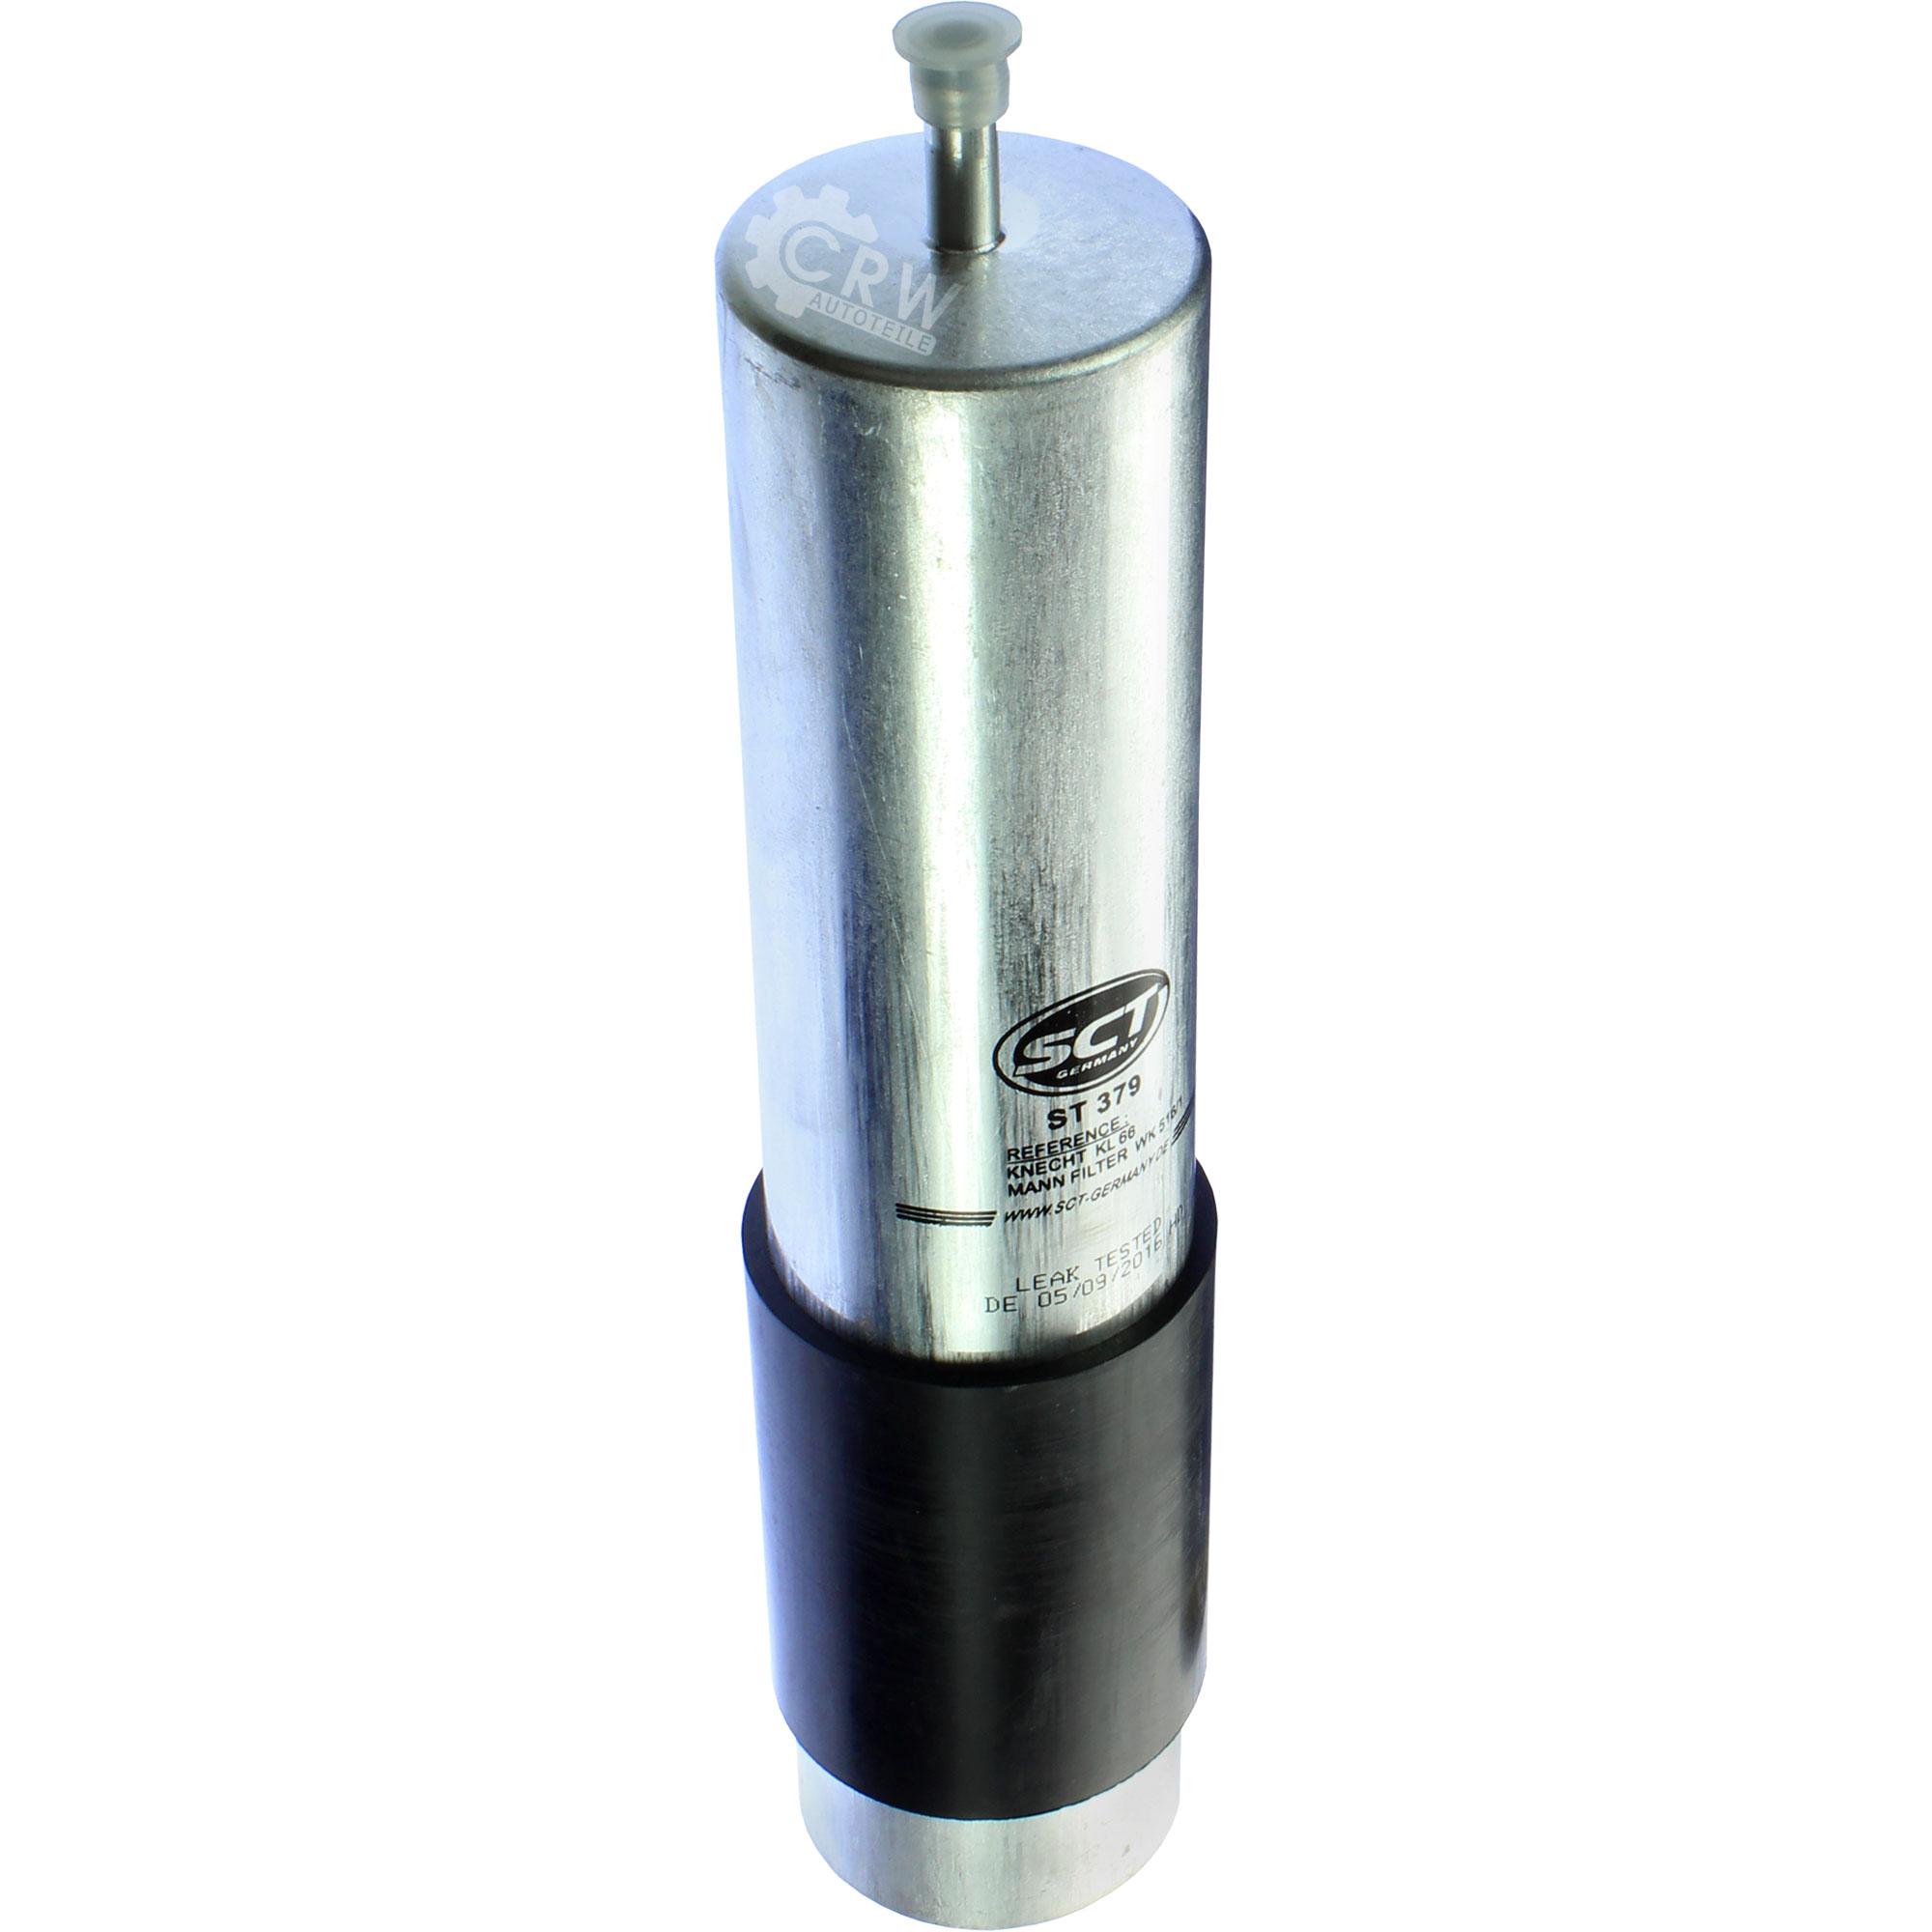 Cambio-de-aceite-set-5l-MANNOL-energy-premium-5w-30-aceite-del-motor-filtro-sct-kit-10140082 miniatura 12